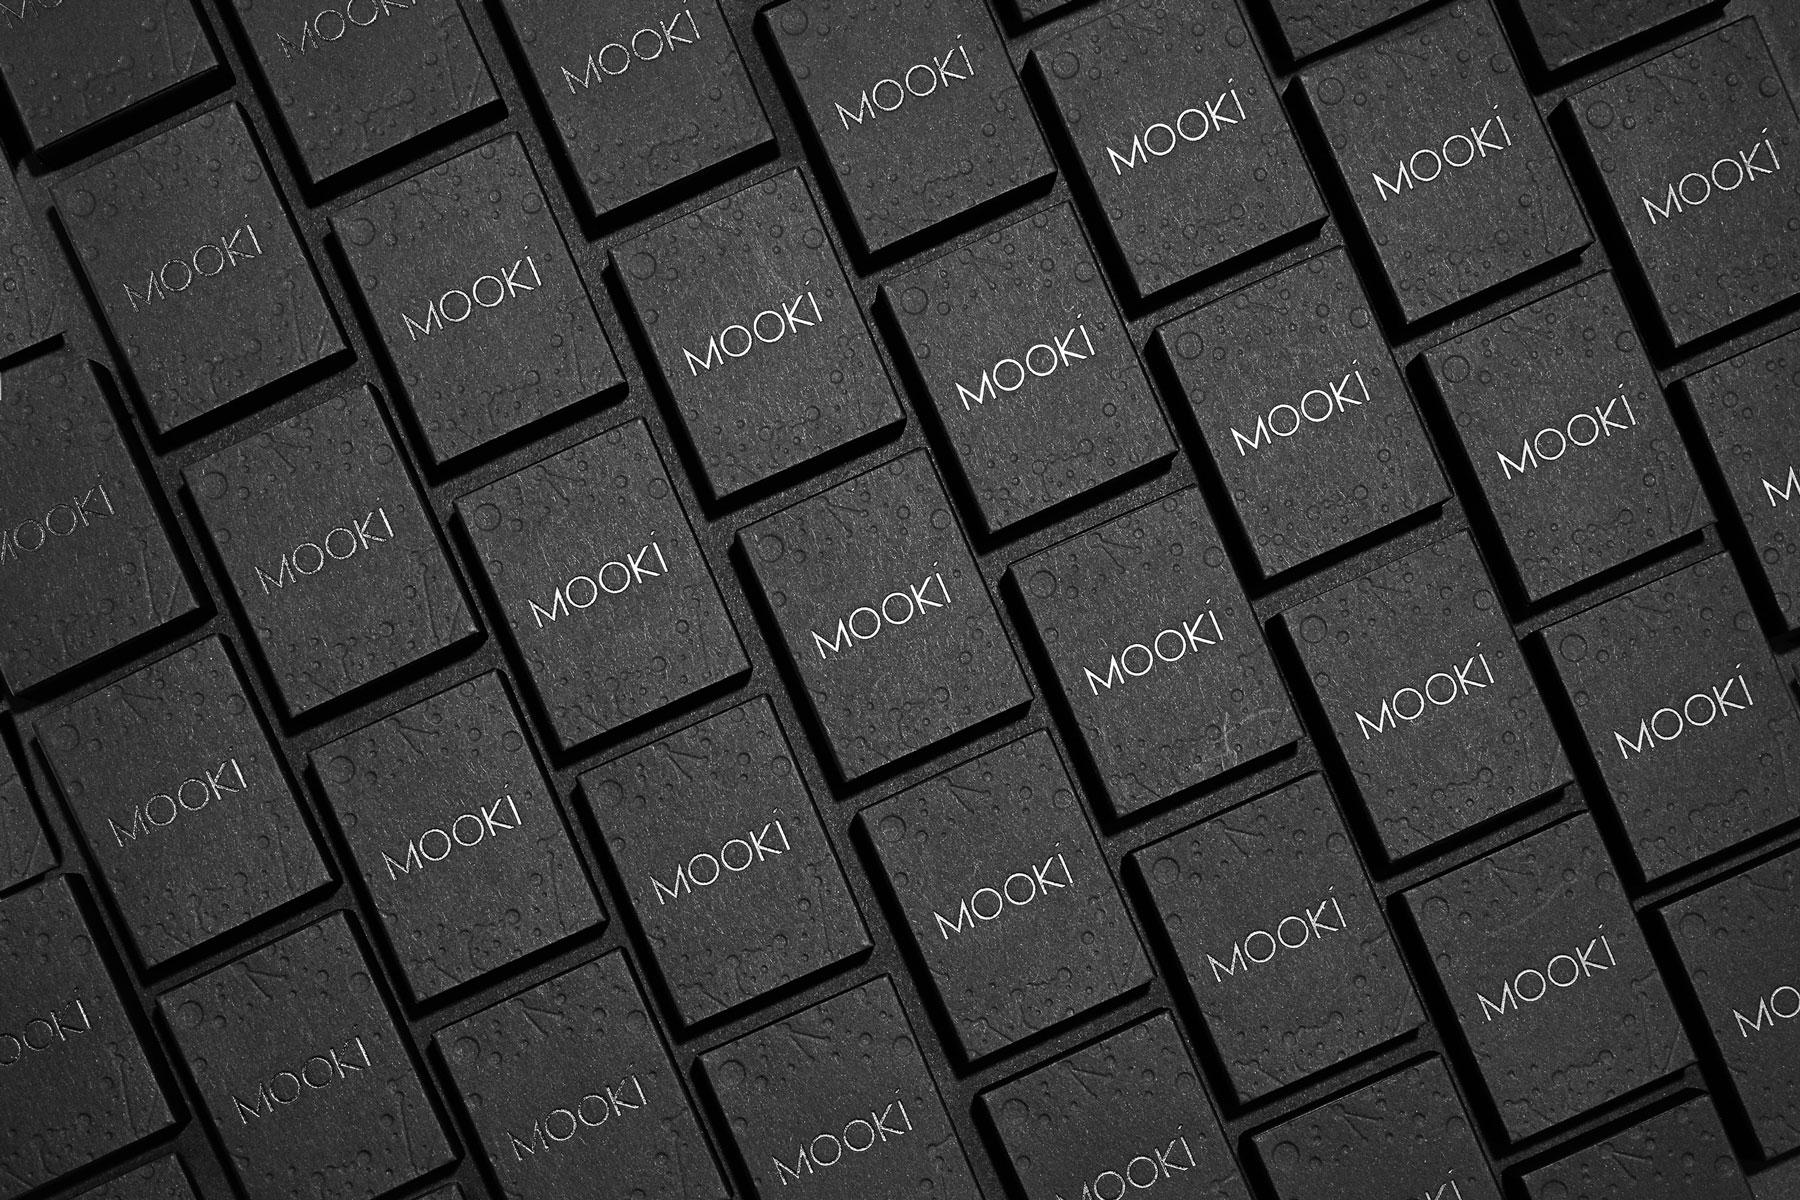 Letterpress and Foil Packaging for Mooki on Keaykolour Jet Black 1